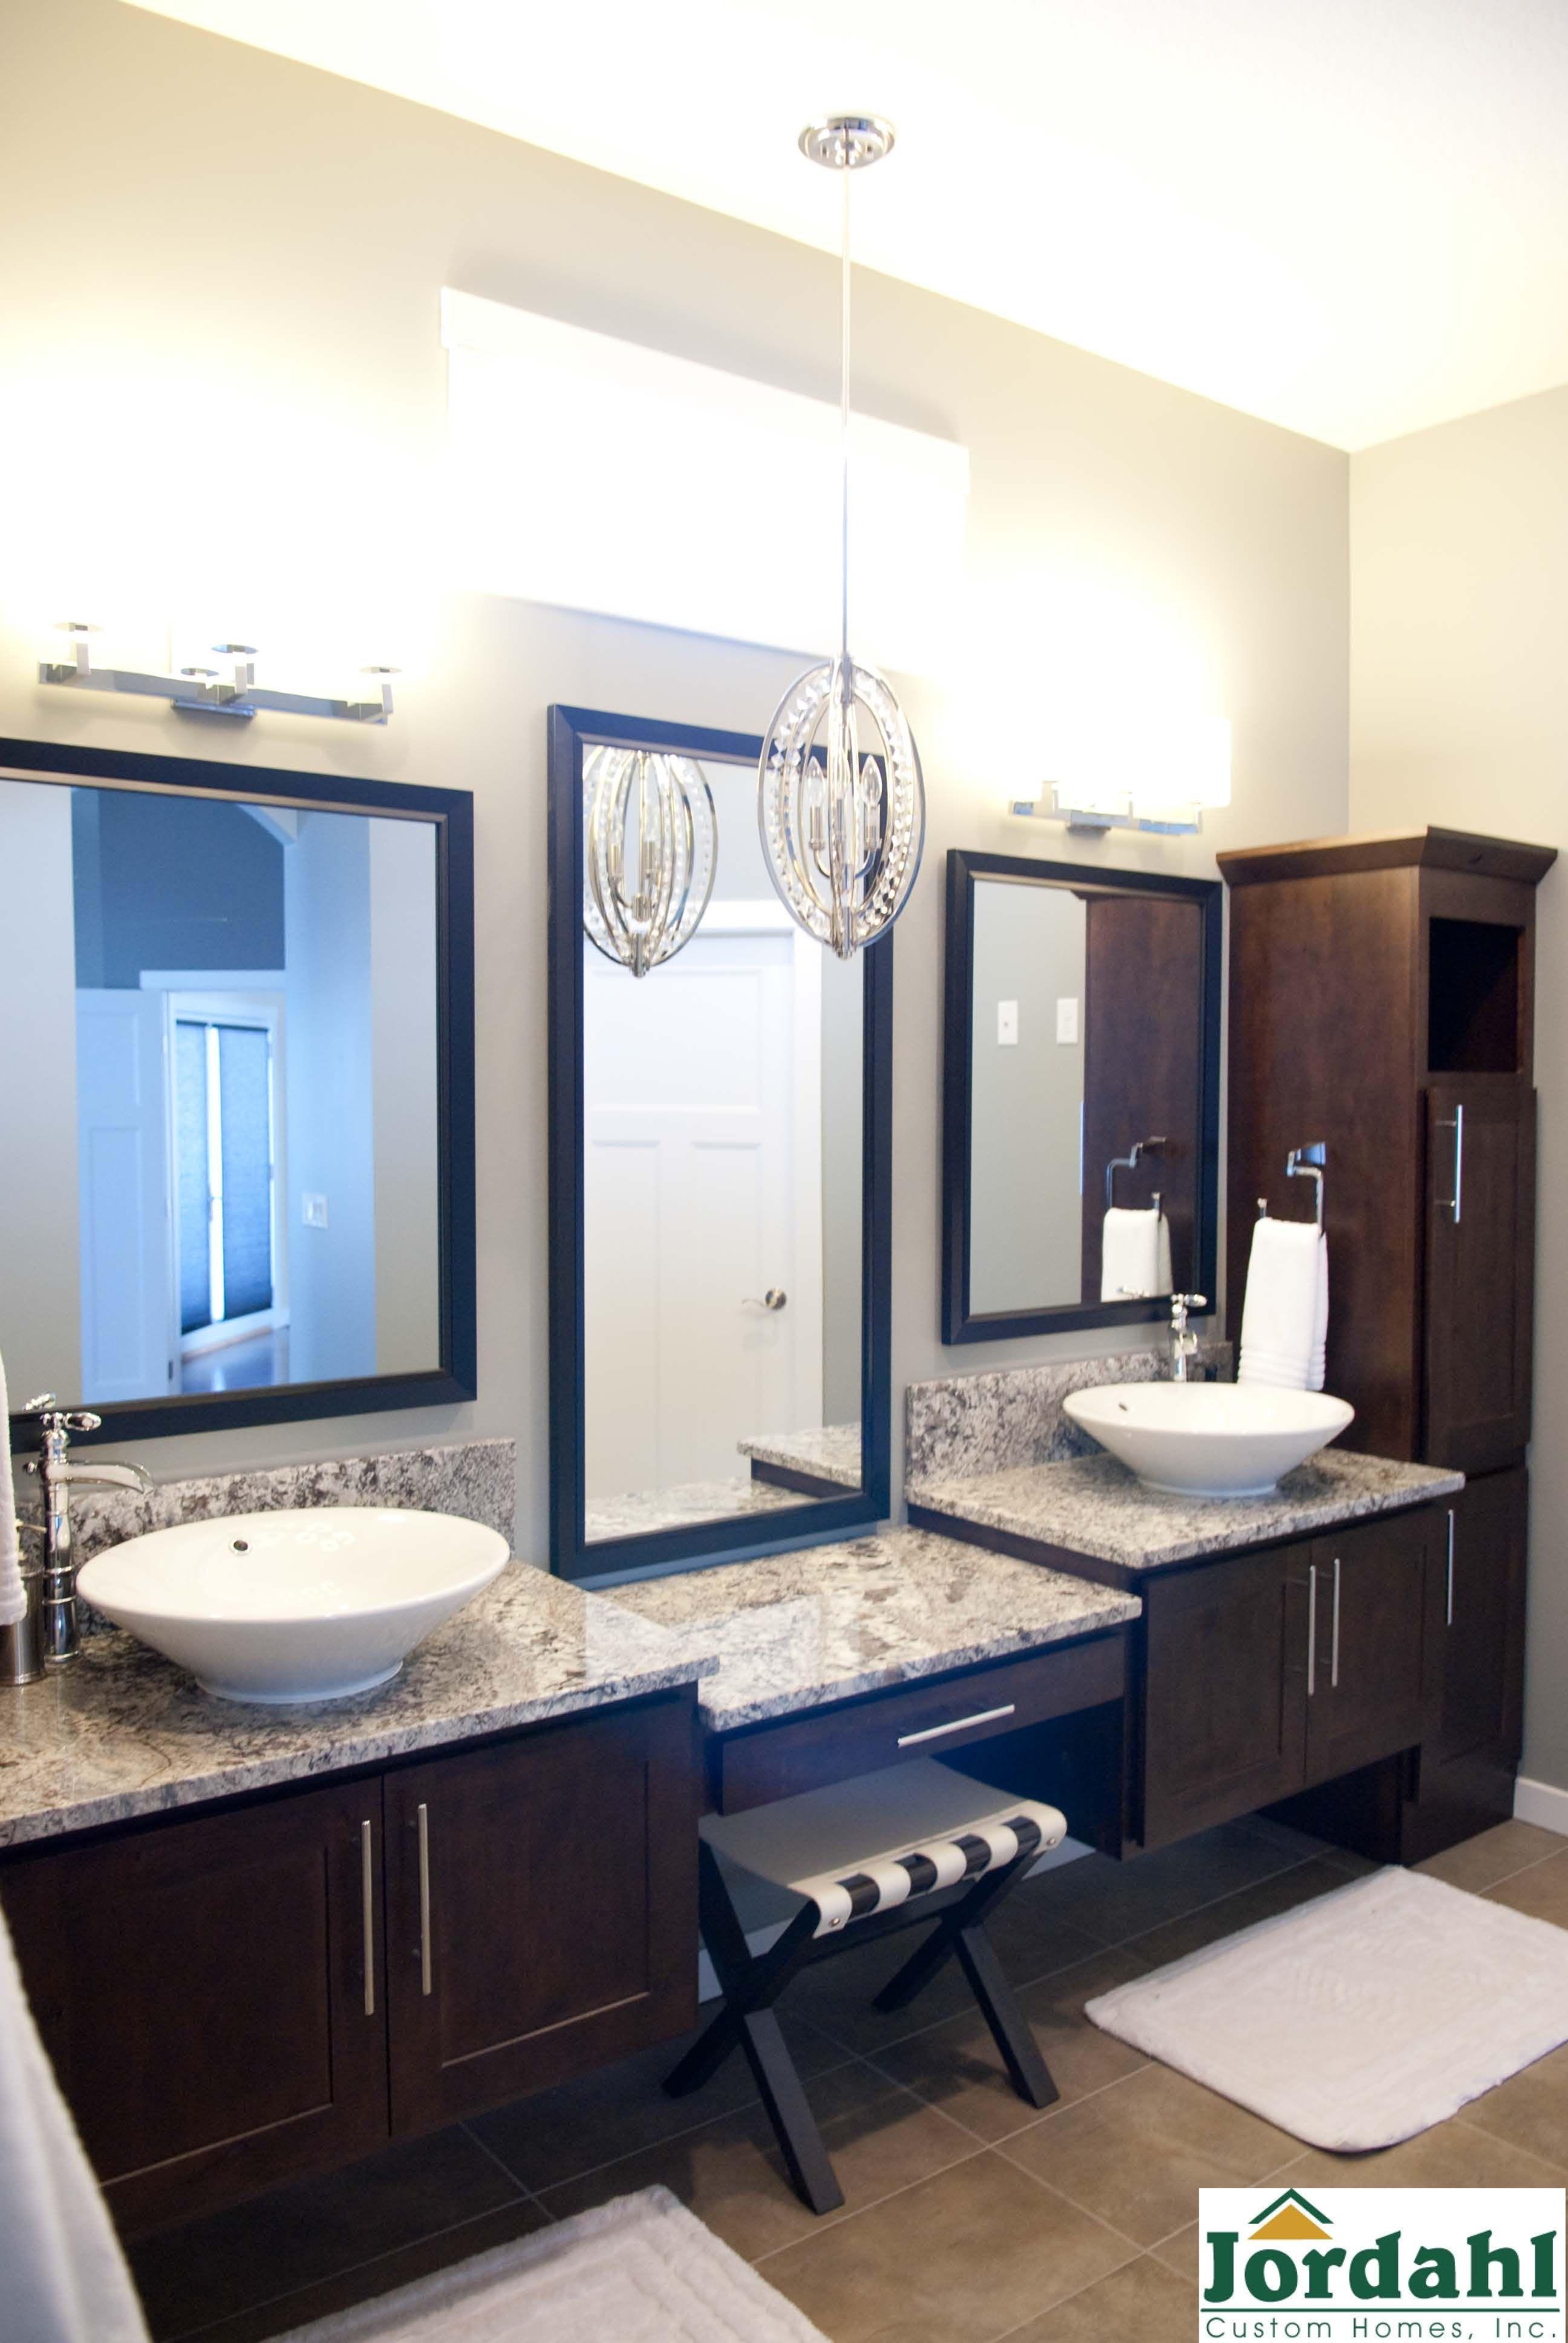 Your Style Your Home Jordahl Custom Homes Bathroom Vanity